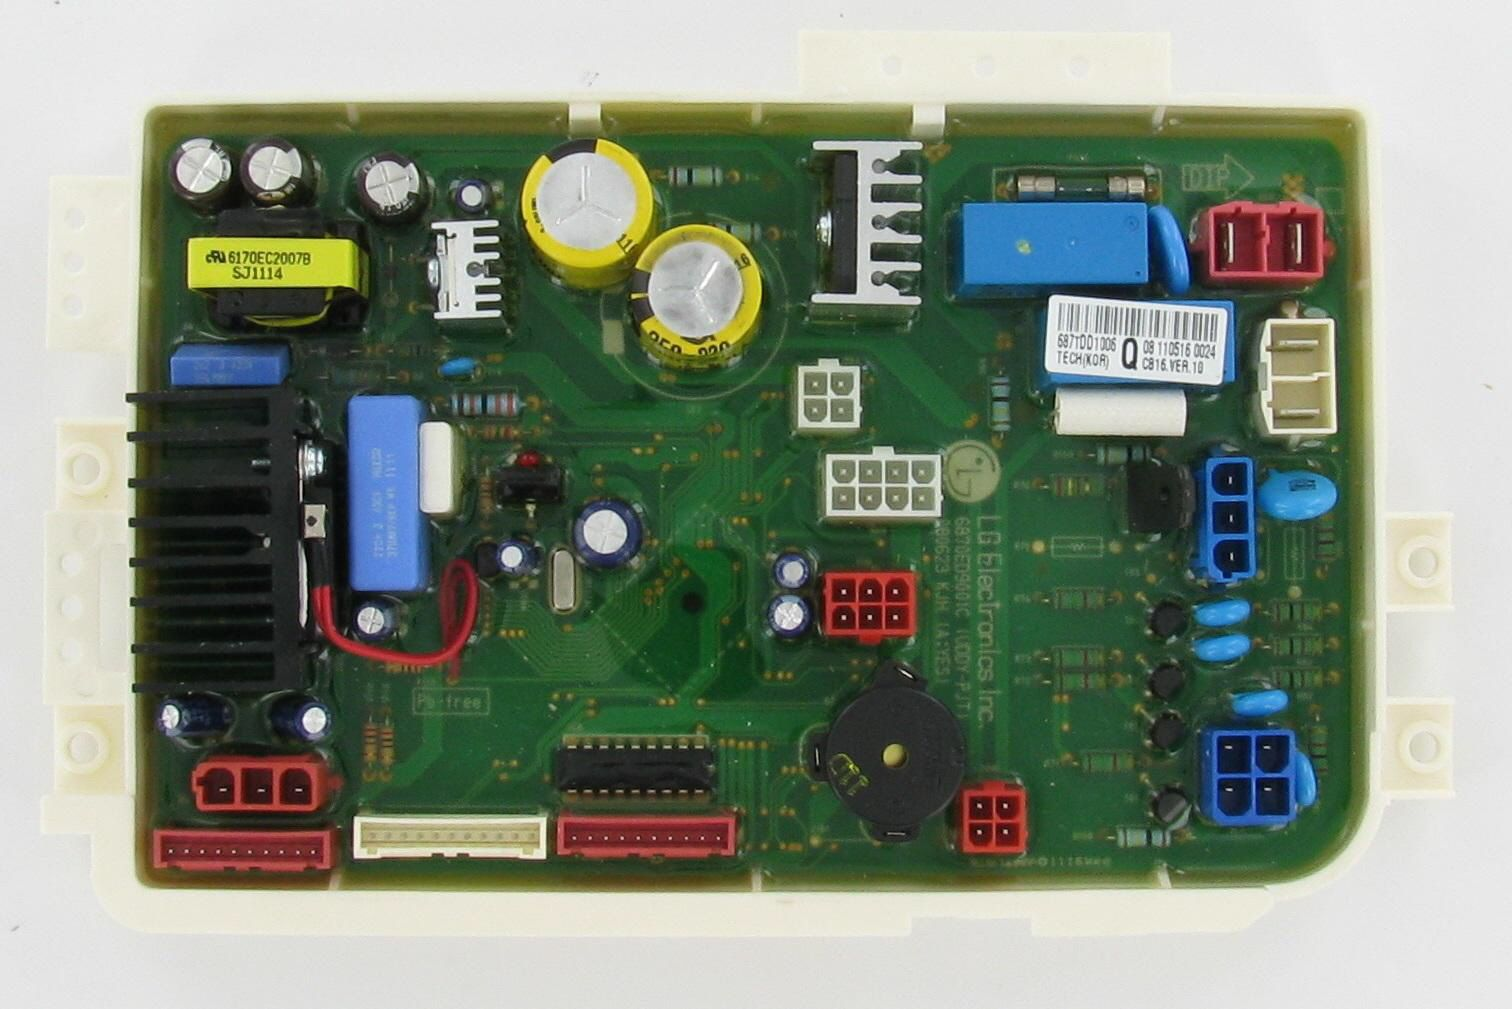 Lg 6871dd1006q Dishwasher Pcb Assembly Main Control Board Boards Broken Appliance Dishwasher